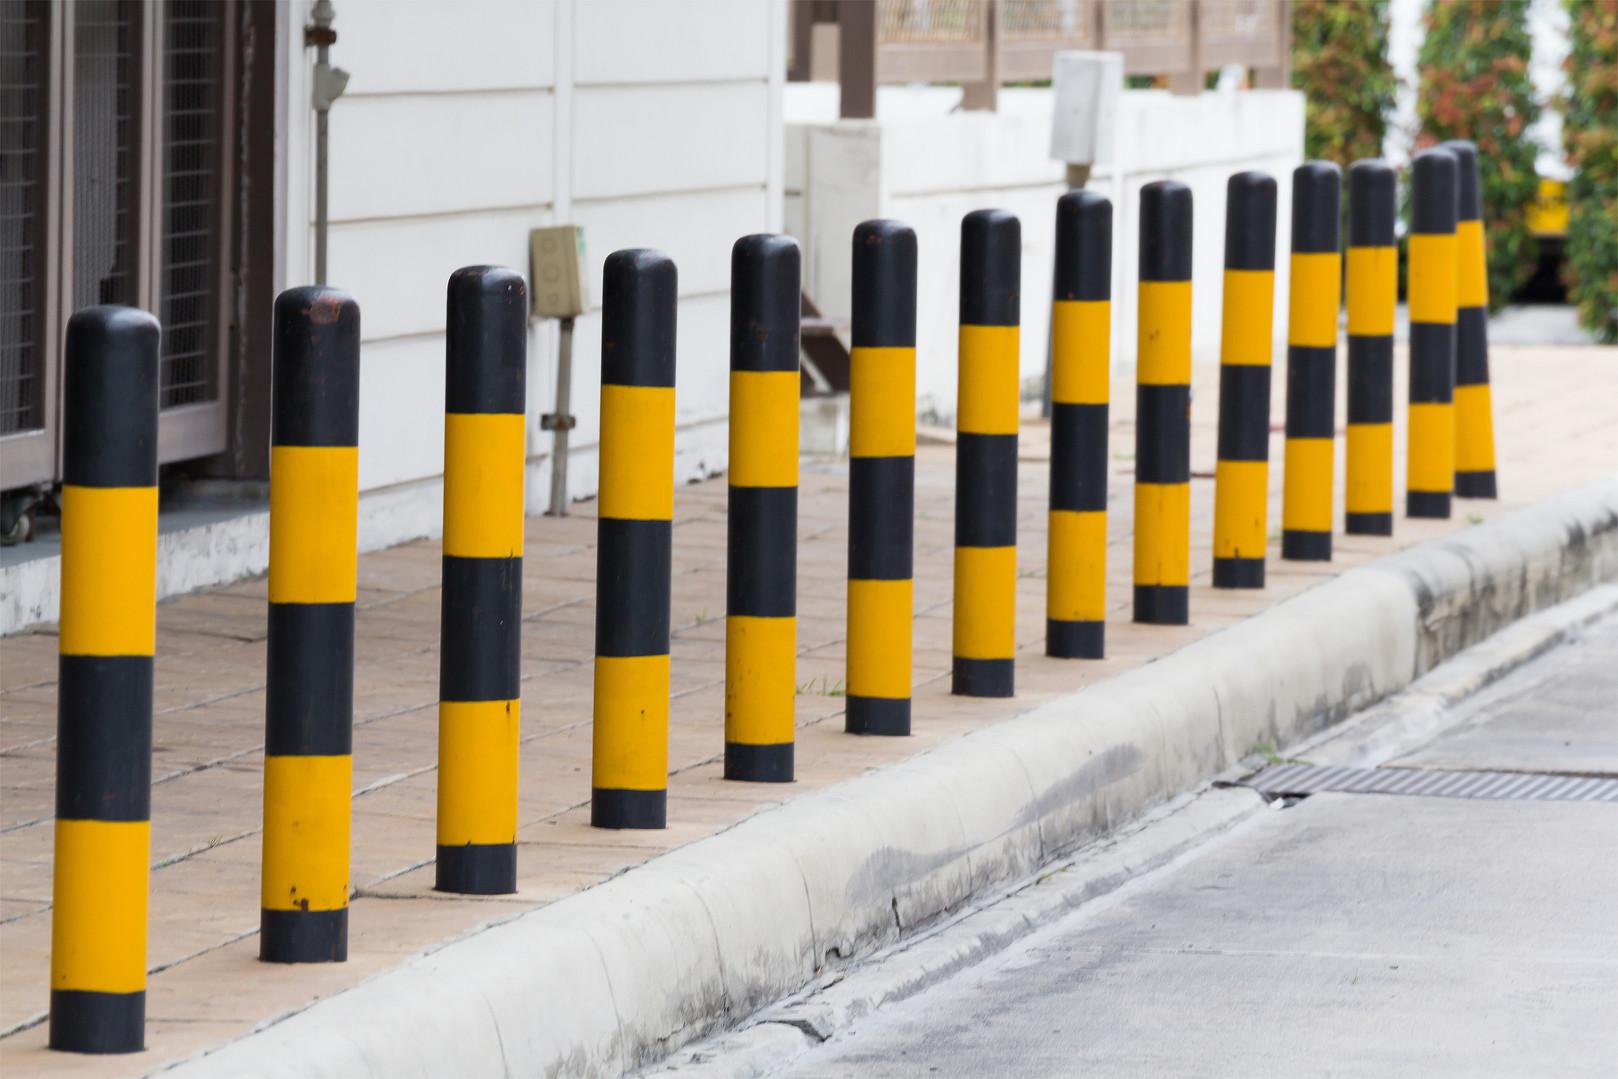 yellow and black steel bollards on footp